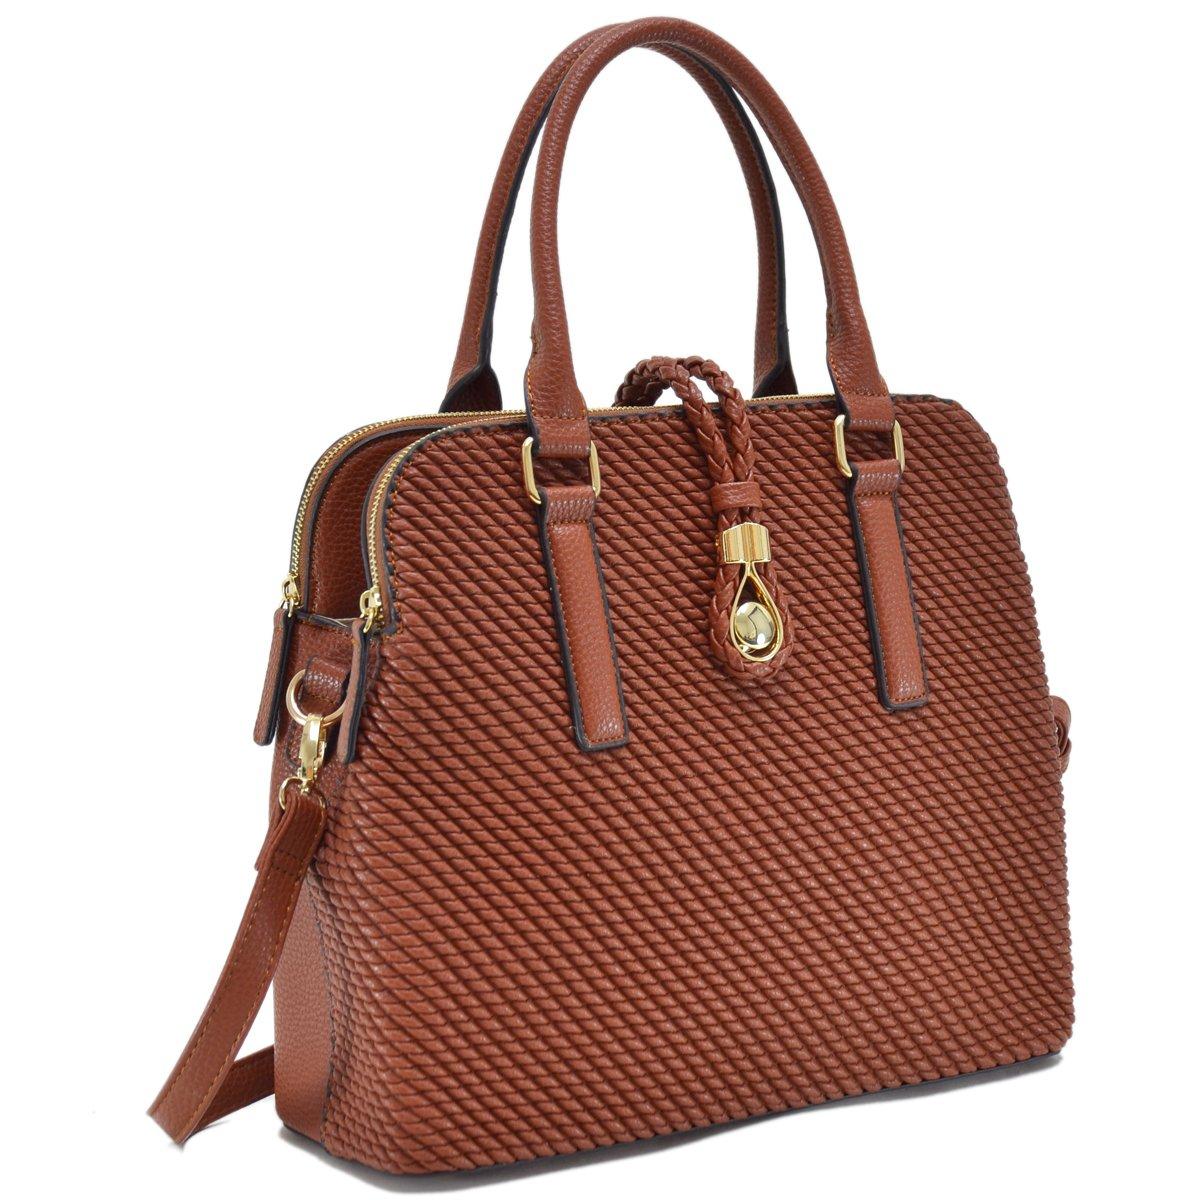 MKP Collection Weaved Design Satchel~Fashion Women Handbag~Boutique Women's Designer Handbag ~Beautiful Designer Shoulder handbag~Classic Shoulder Handbag(6642) Cognac